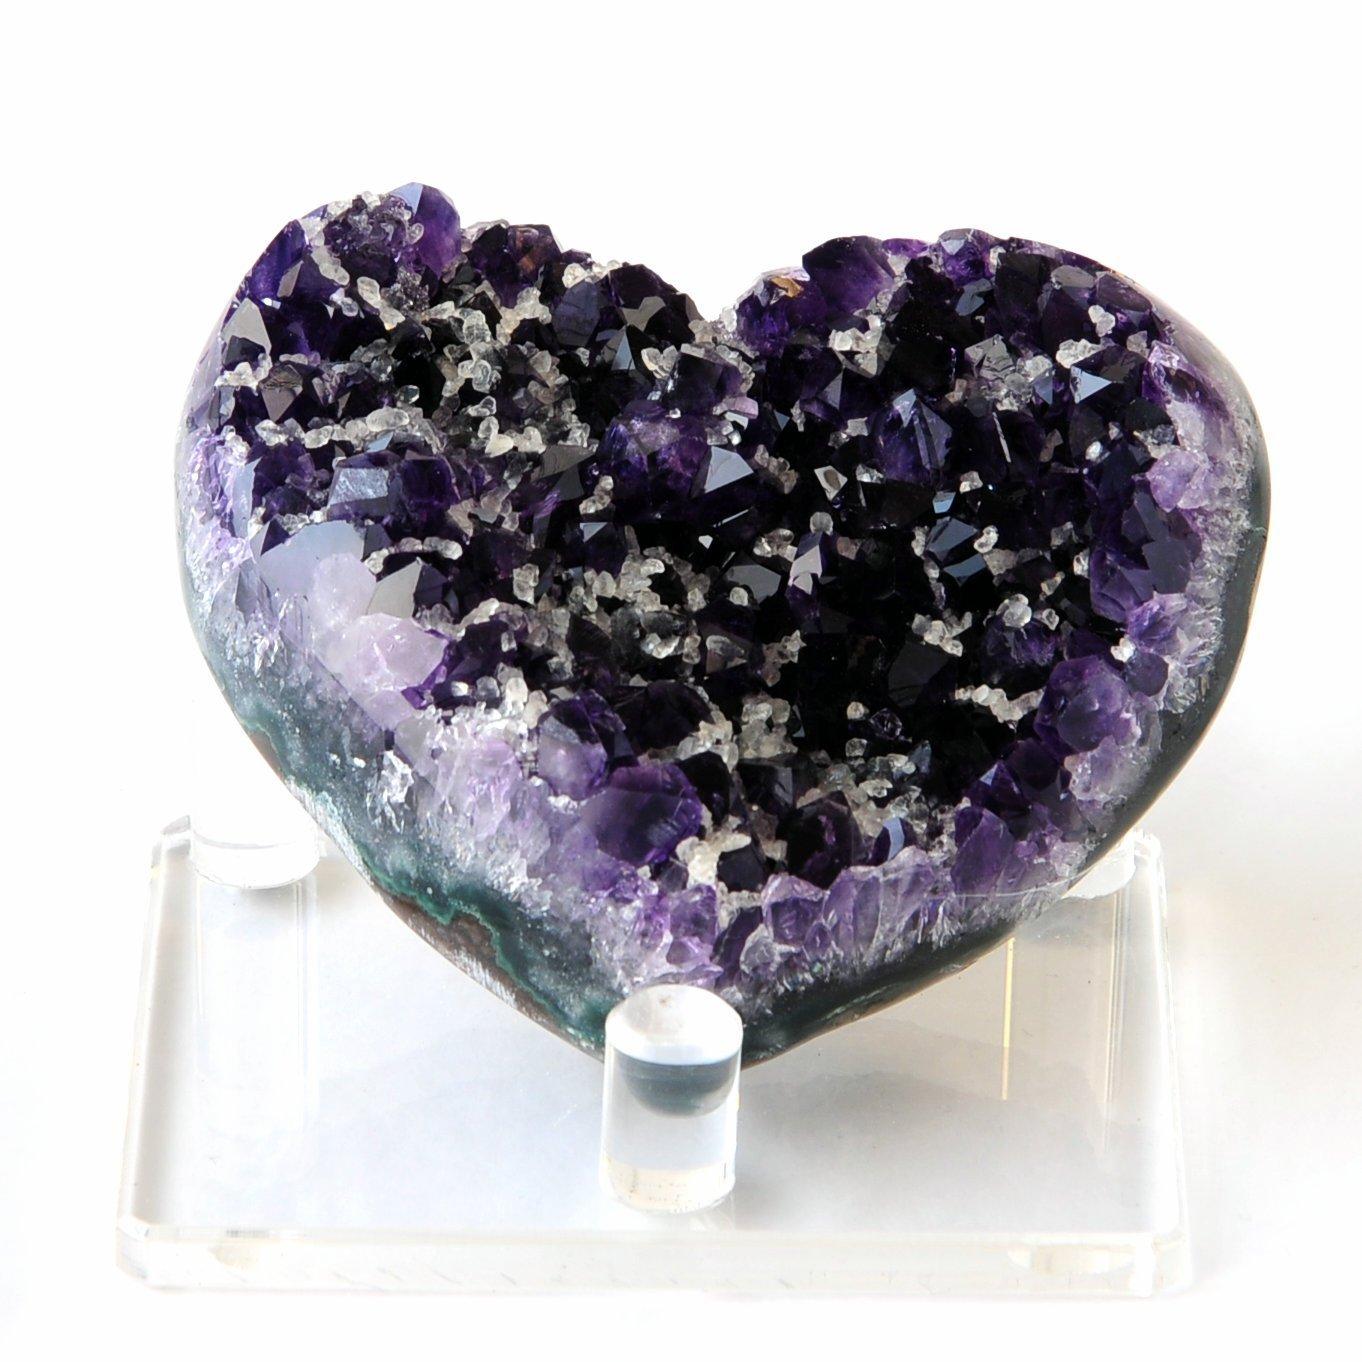 Amethyst Cluster Druzy Heart, $24-289, depending on size